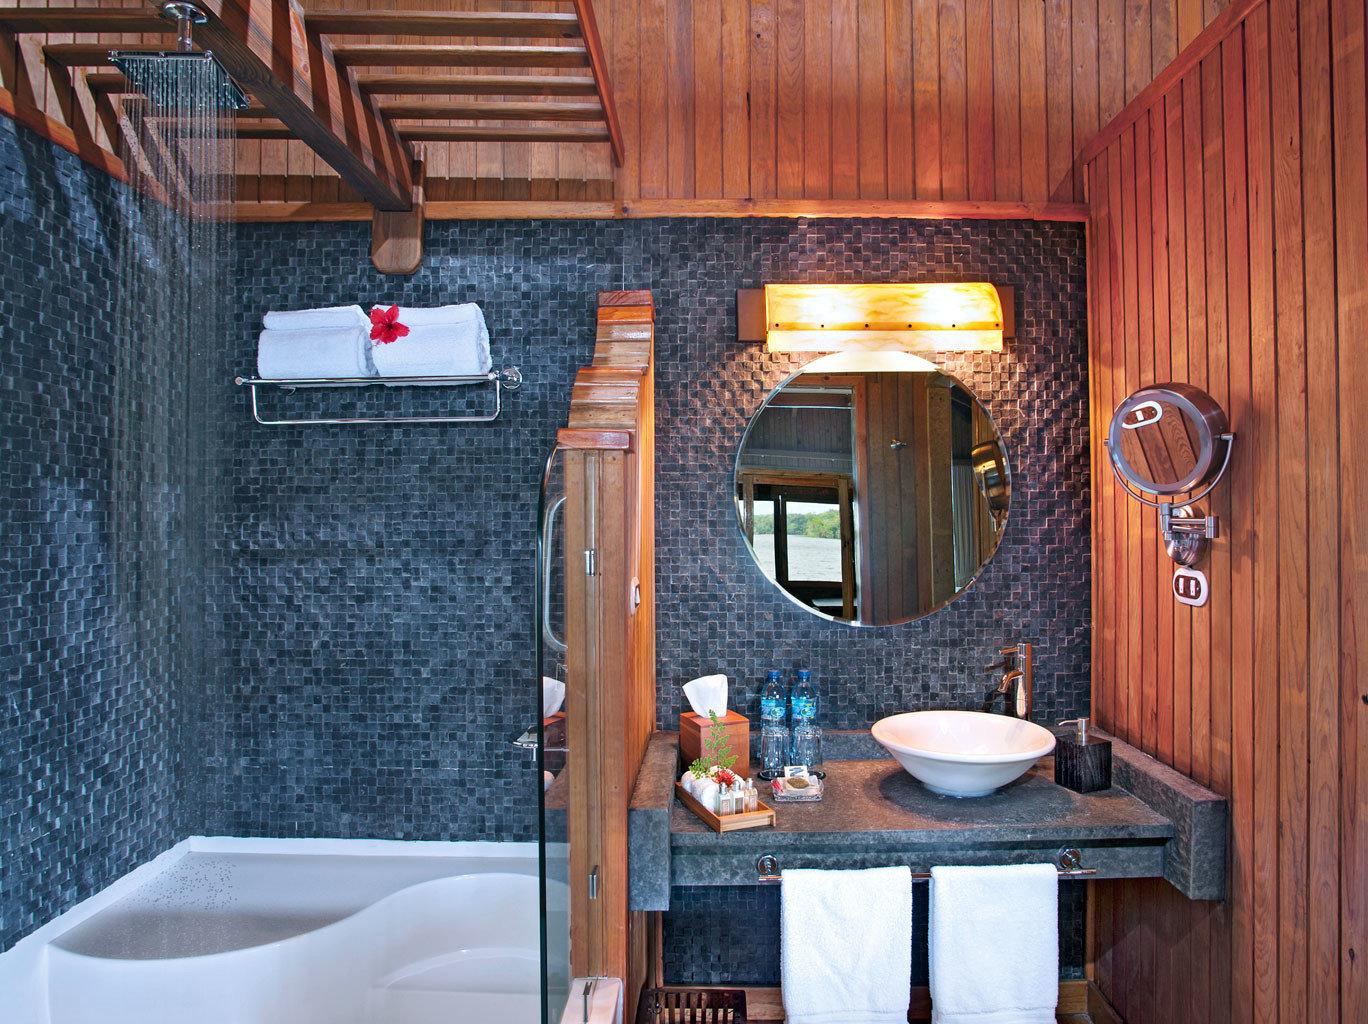 Bath Elegant Luxury Modern house property home cottage log cabin bathroom wooden sink swimming pool toilet